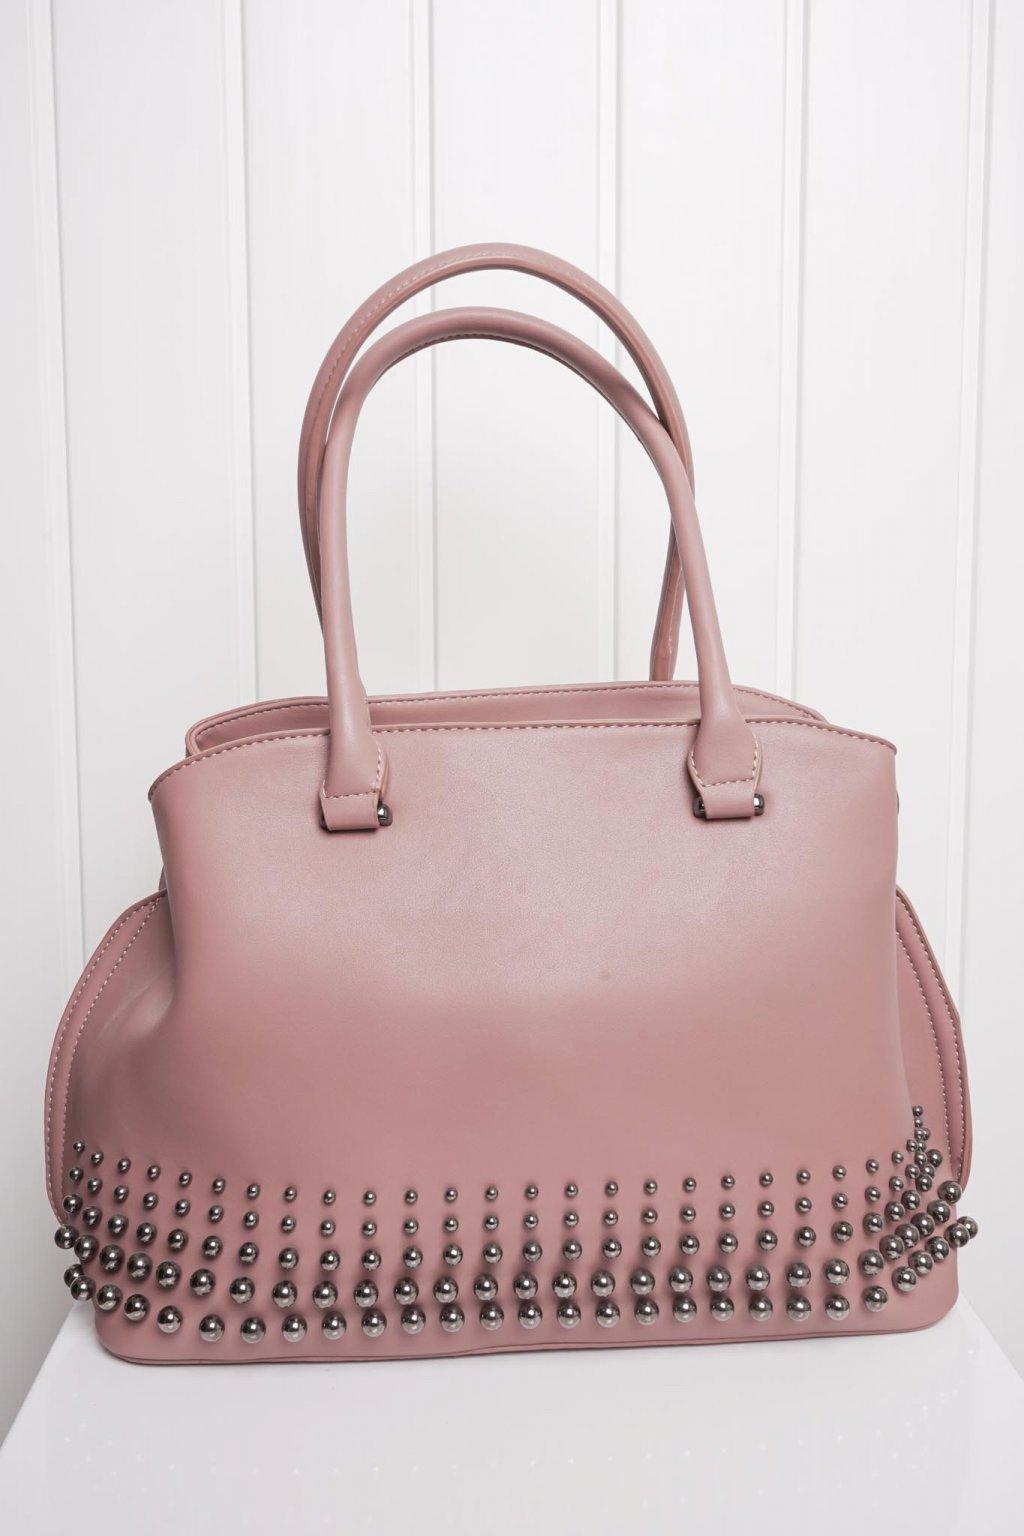 Kabelka, ruksak, dobrá cena, čierna kabelka, čierny ruksak, basic, kabelky, ruksaky 147